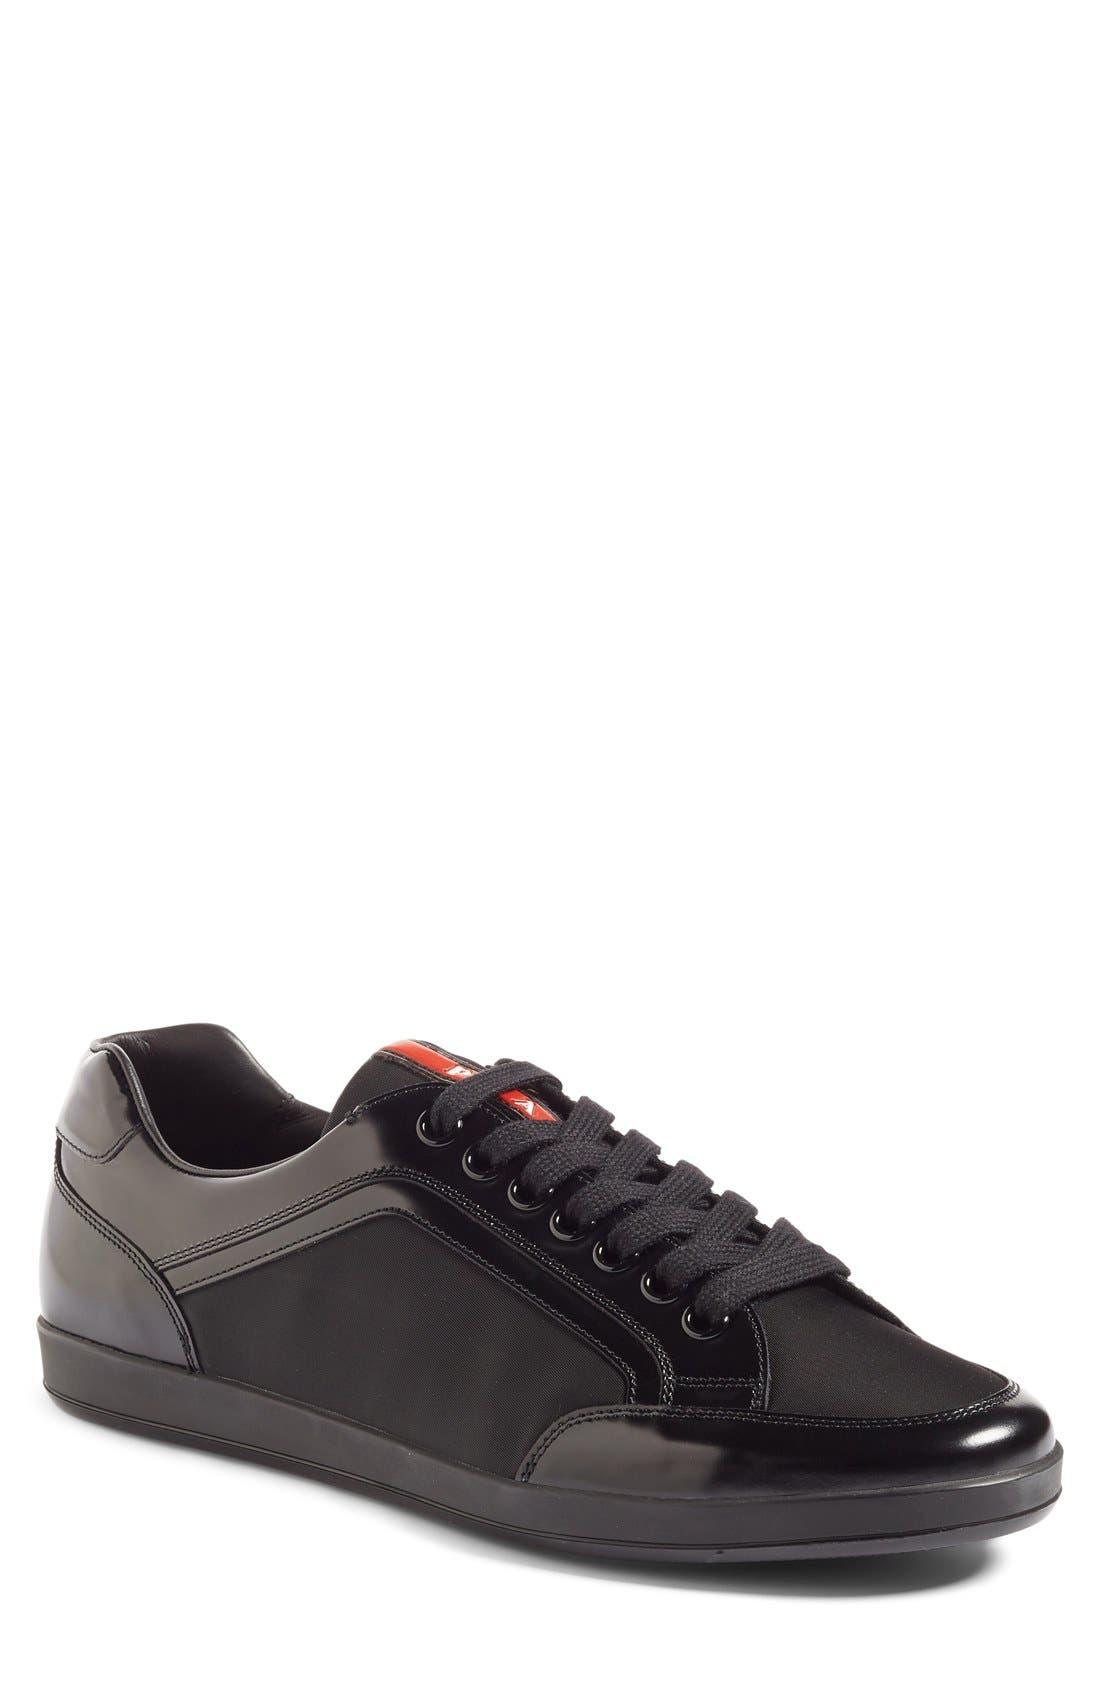 Linea Rossa Sneaker,                             Main thumbnail 1, color,                             001